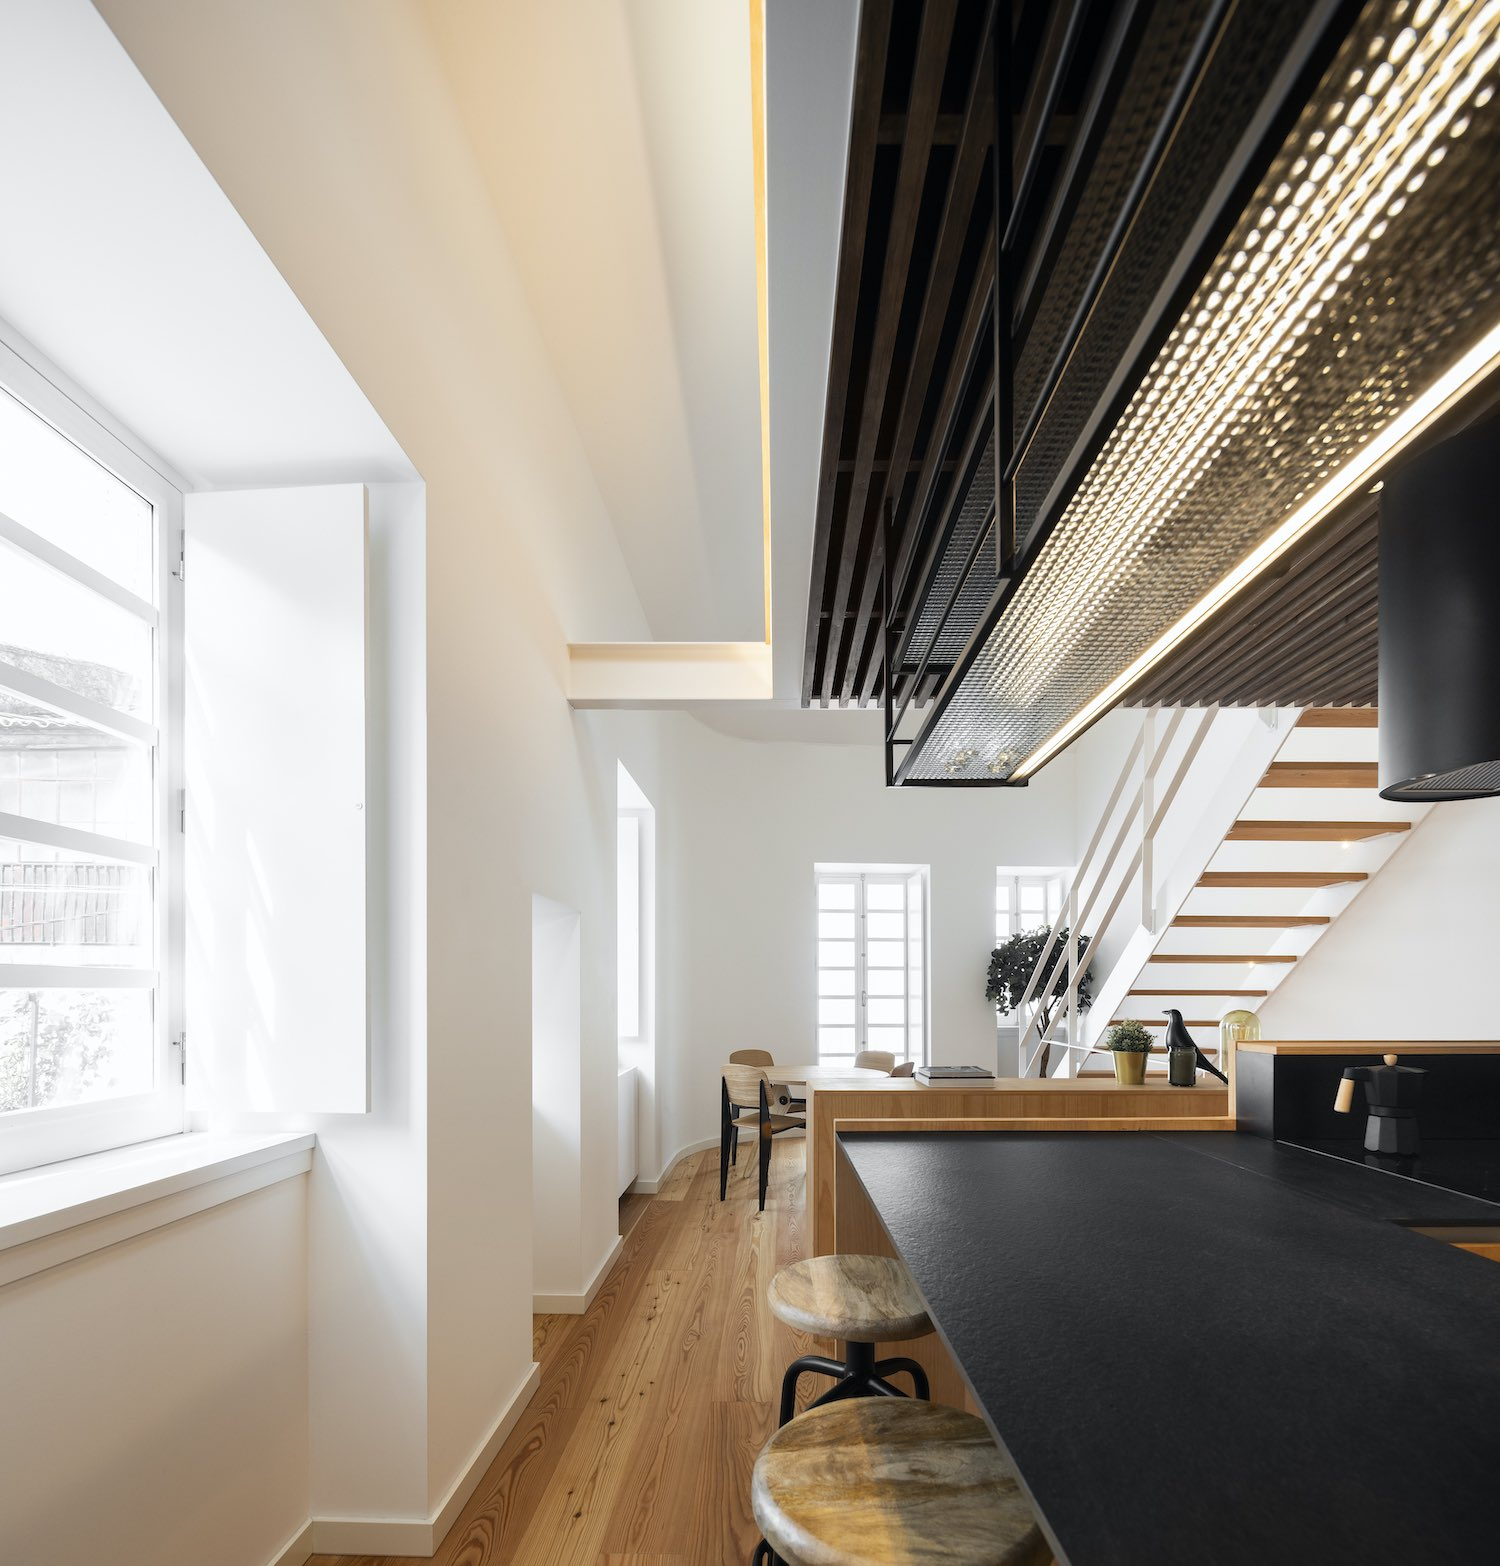 stool bar in the corridor